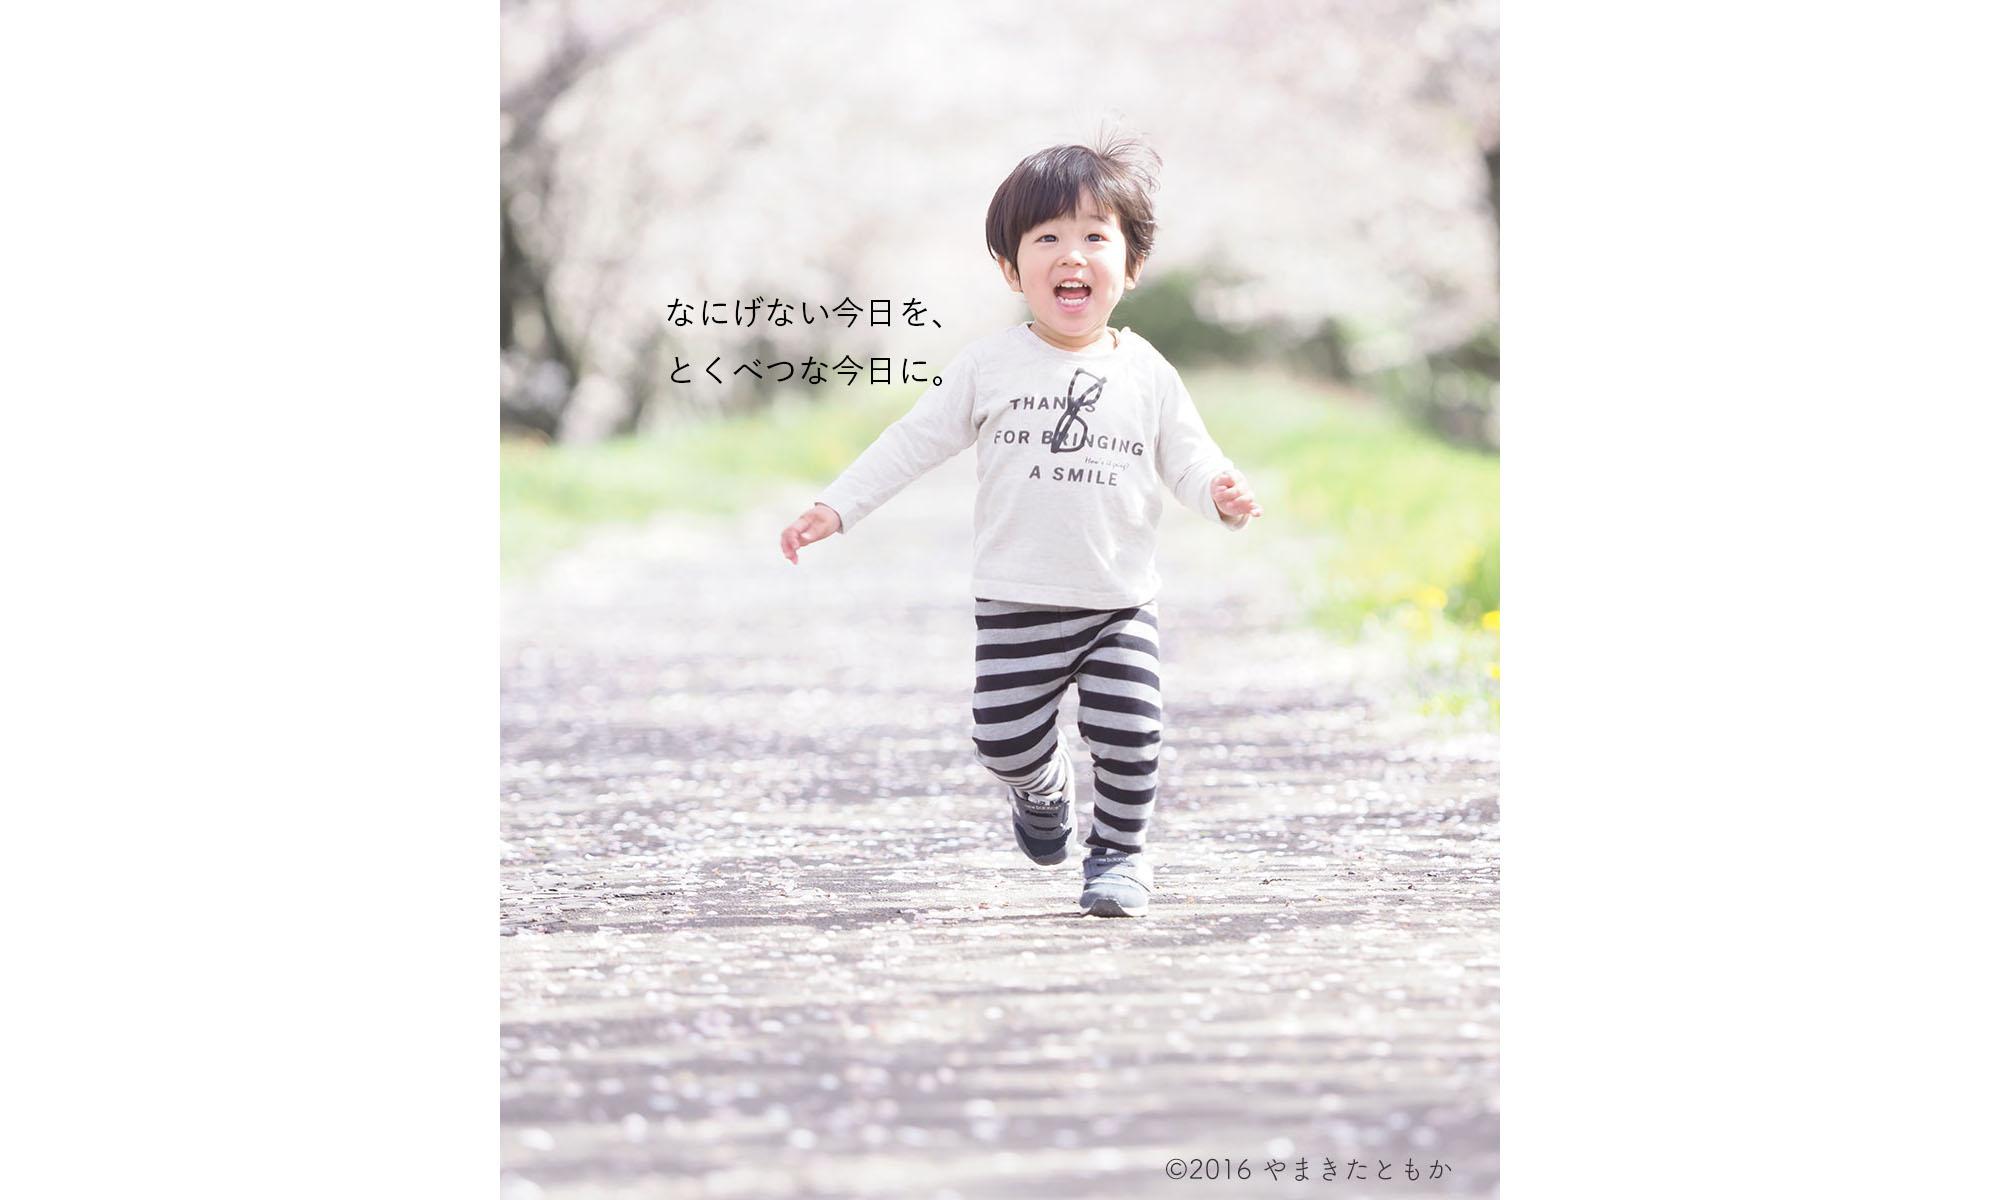 Yamakita Tomoka|やまきたともかのBabykids Family Photo|岐阜  大垣 羽島 一宮